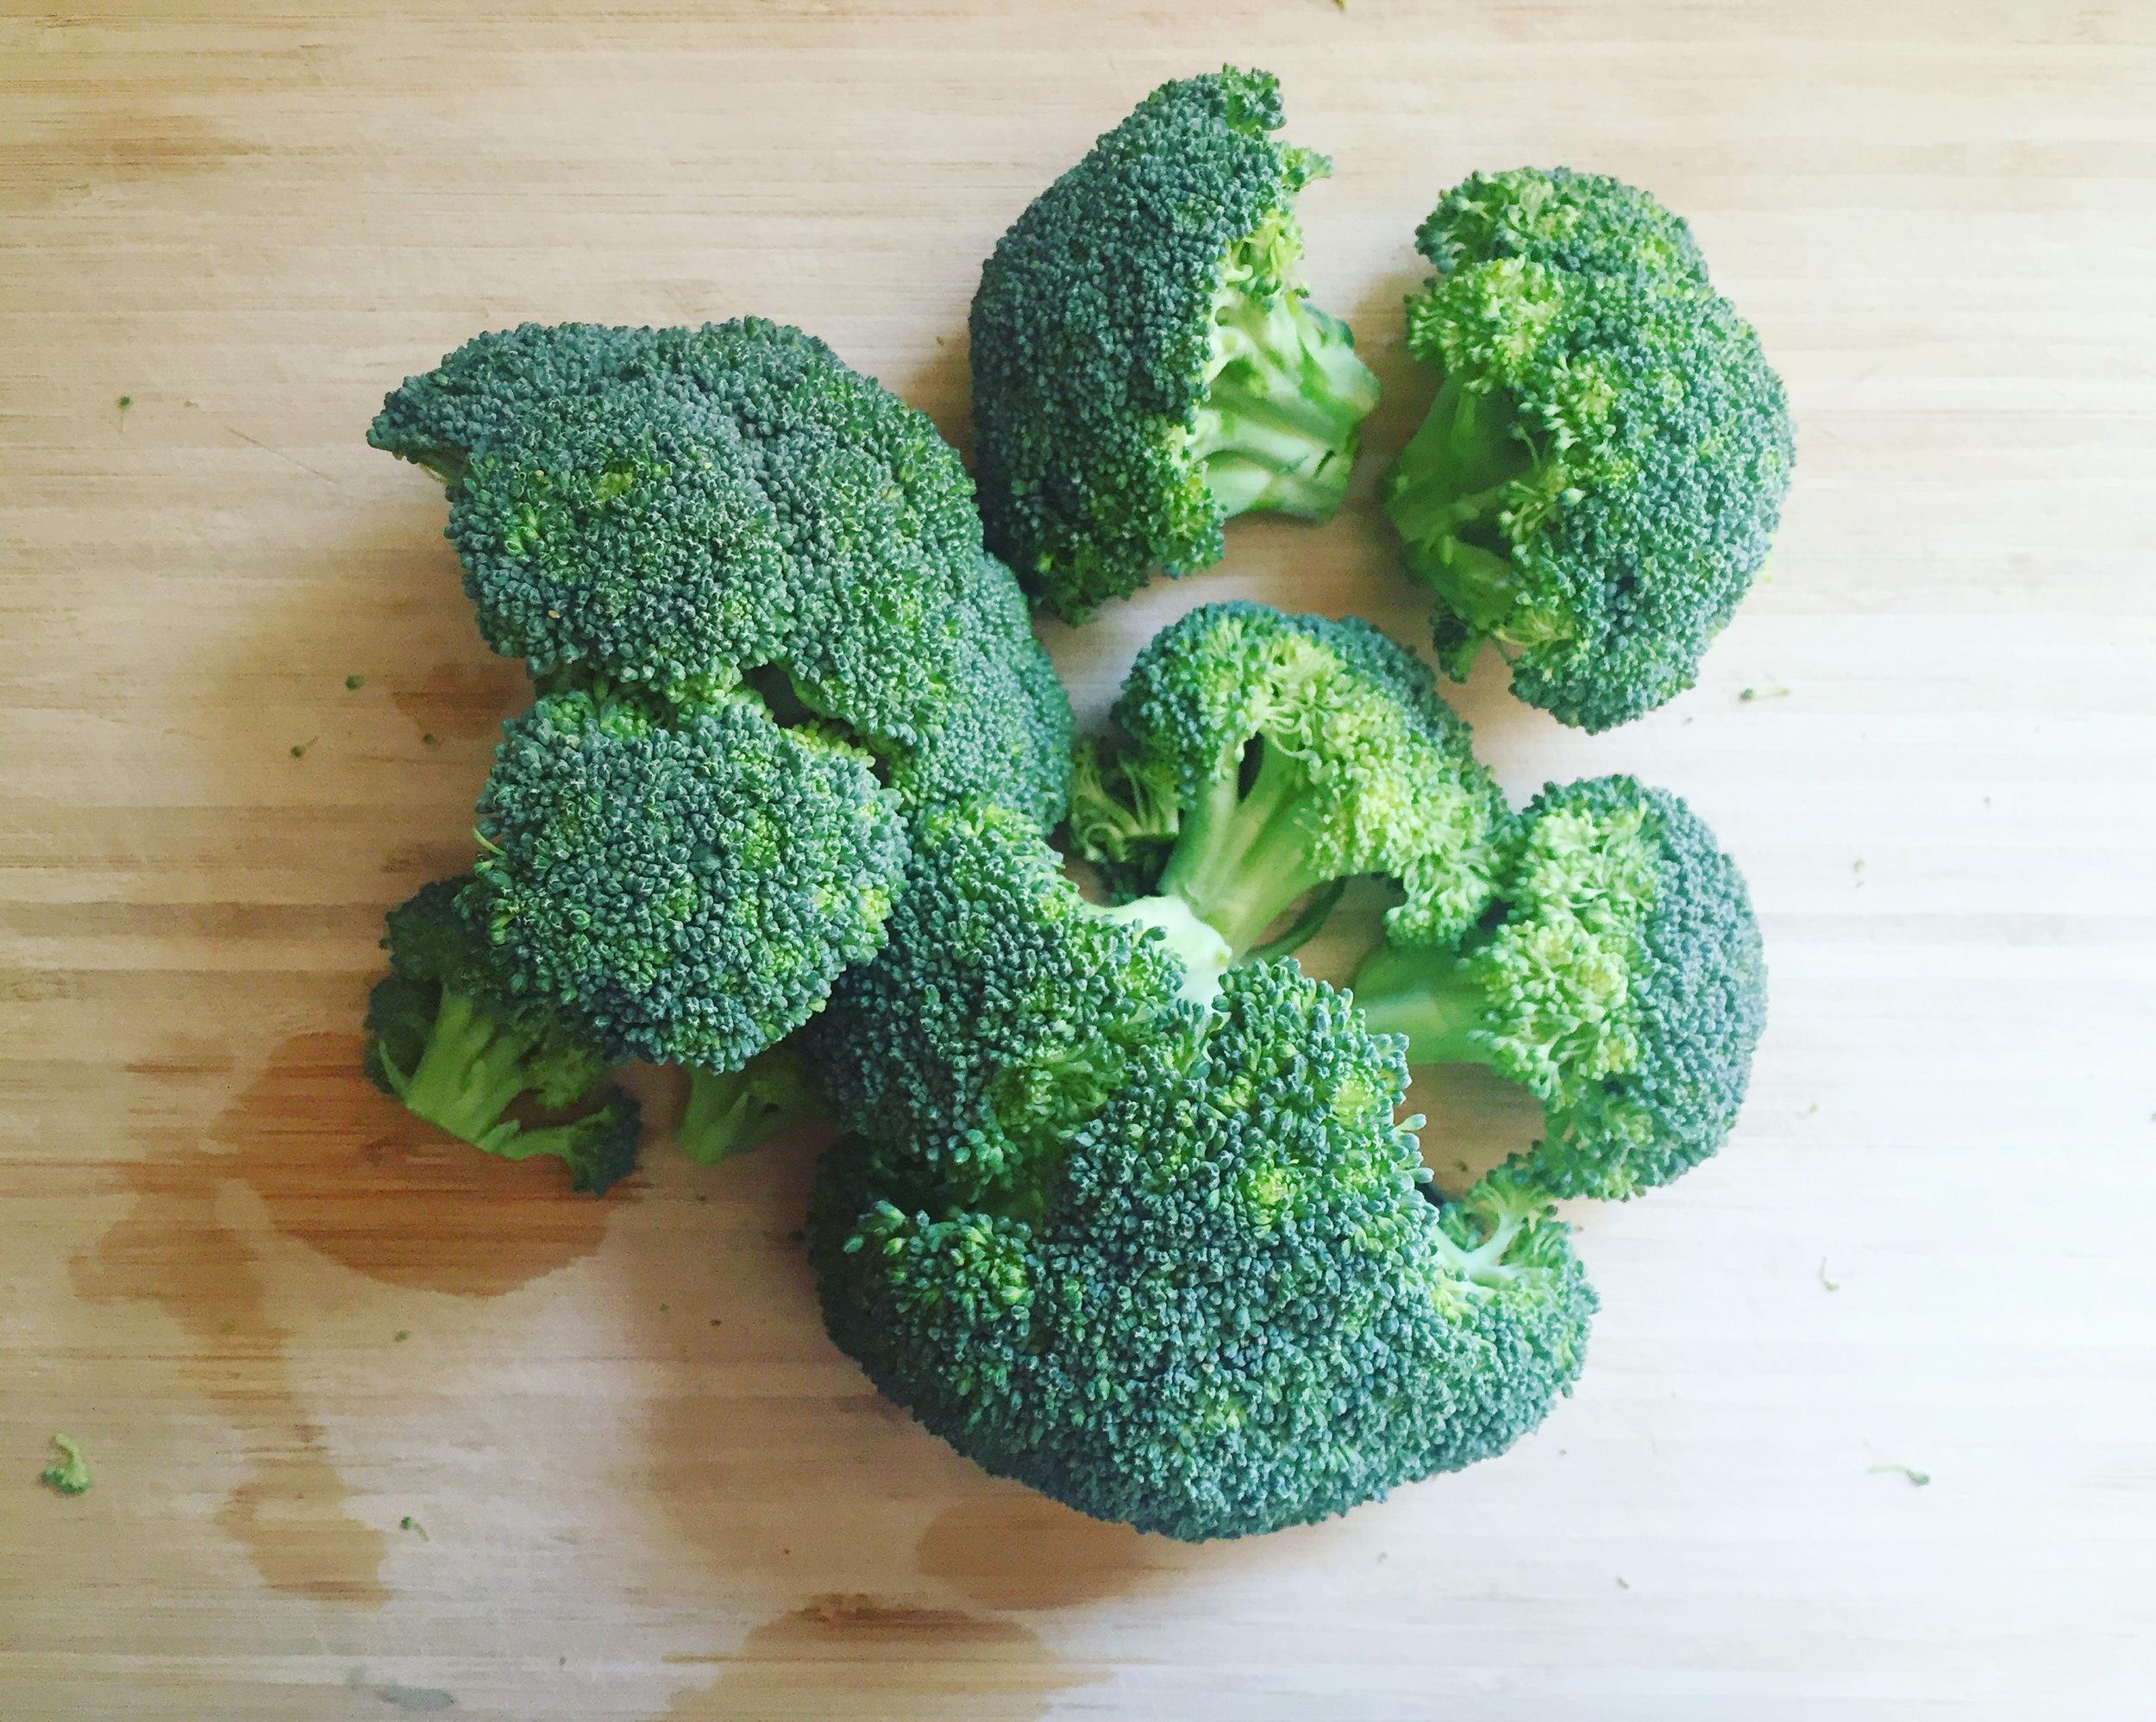 baby-toddler-finger-food-broccoli-nuggets